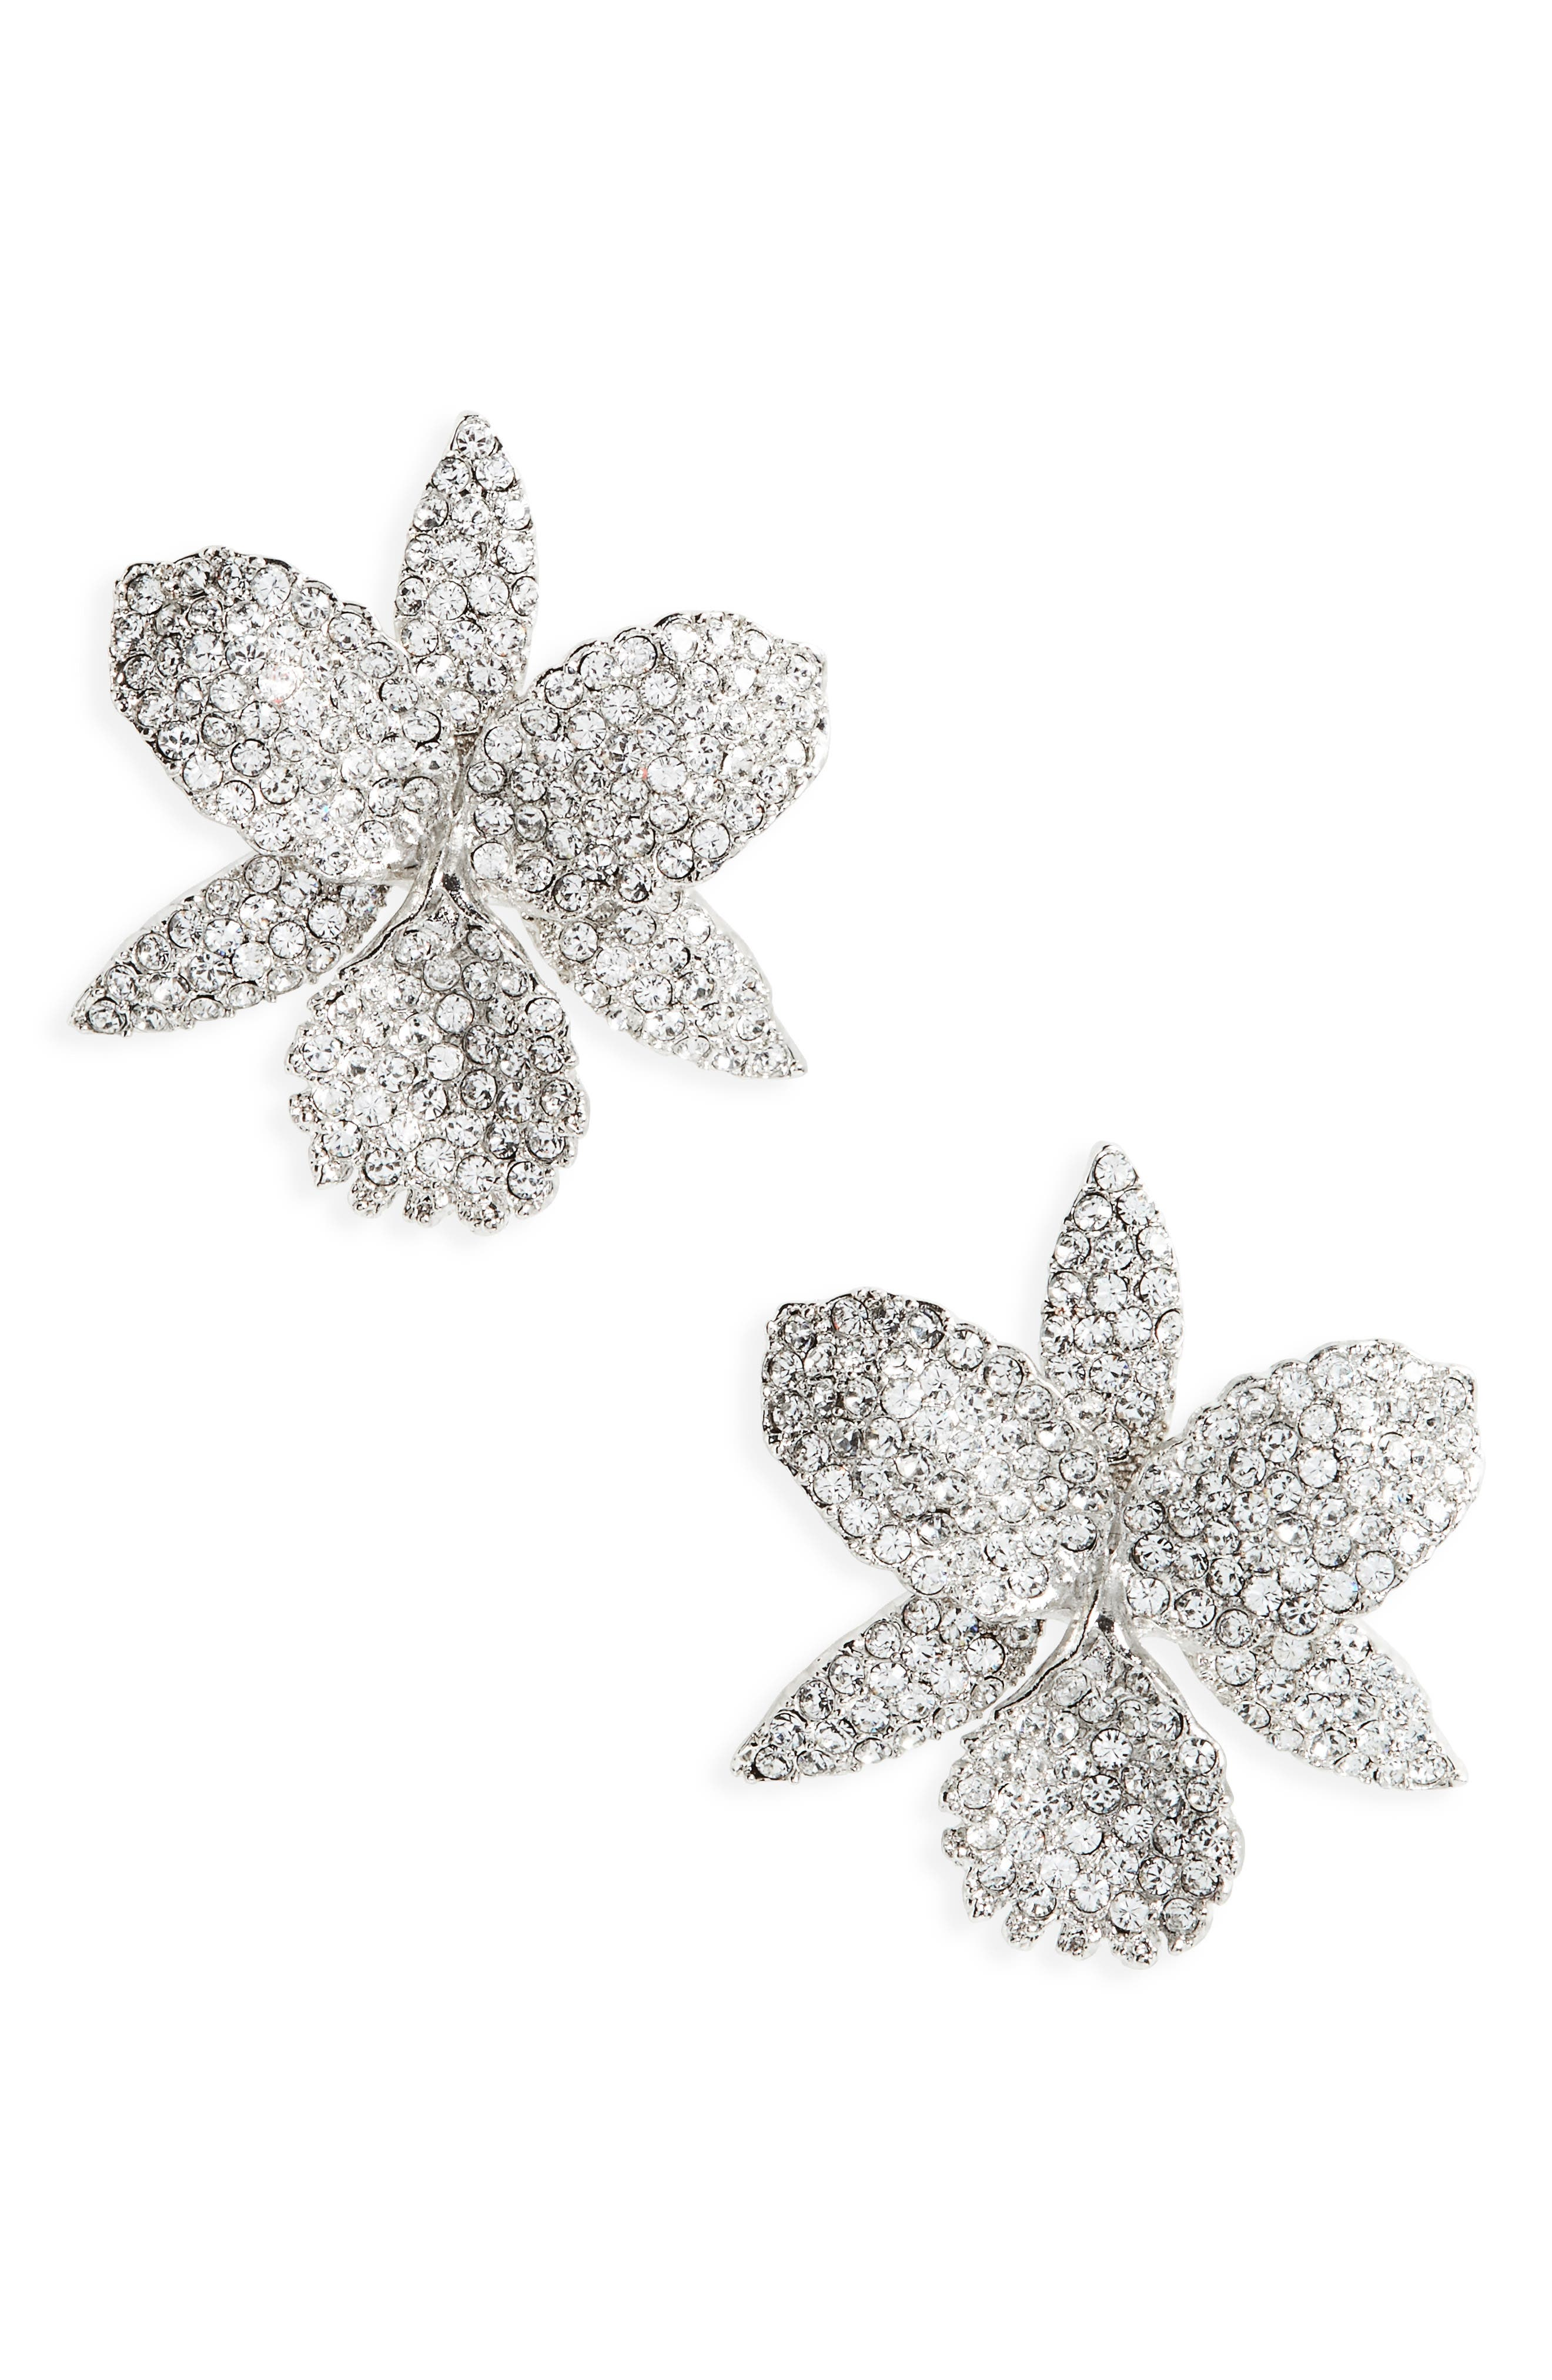 Main Image - Nina Large Orchid Stud Earrings